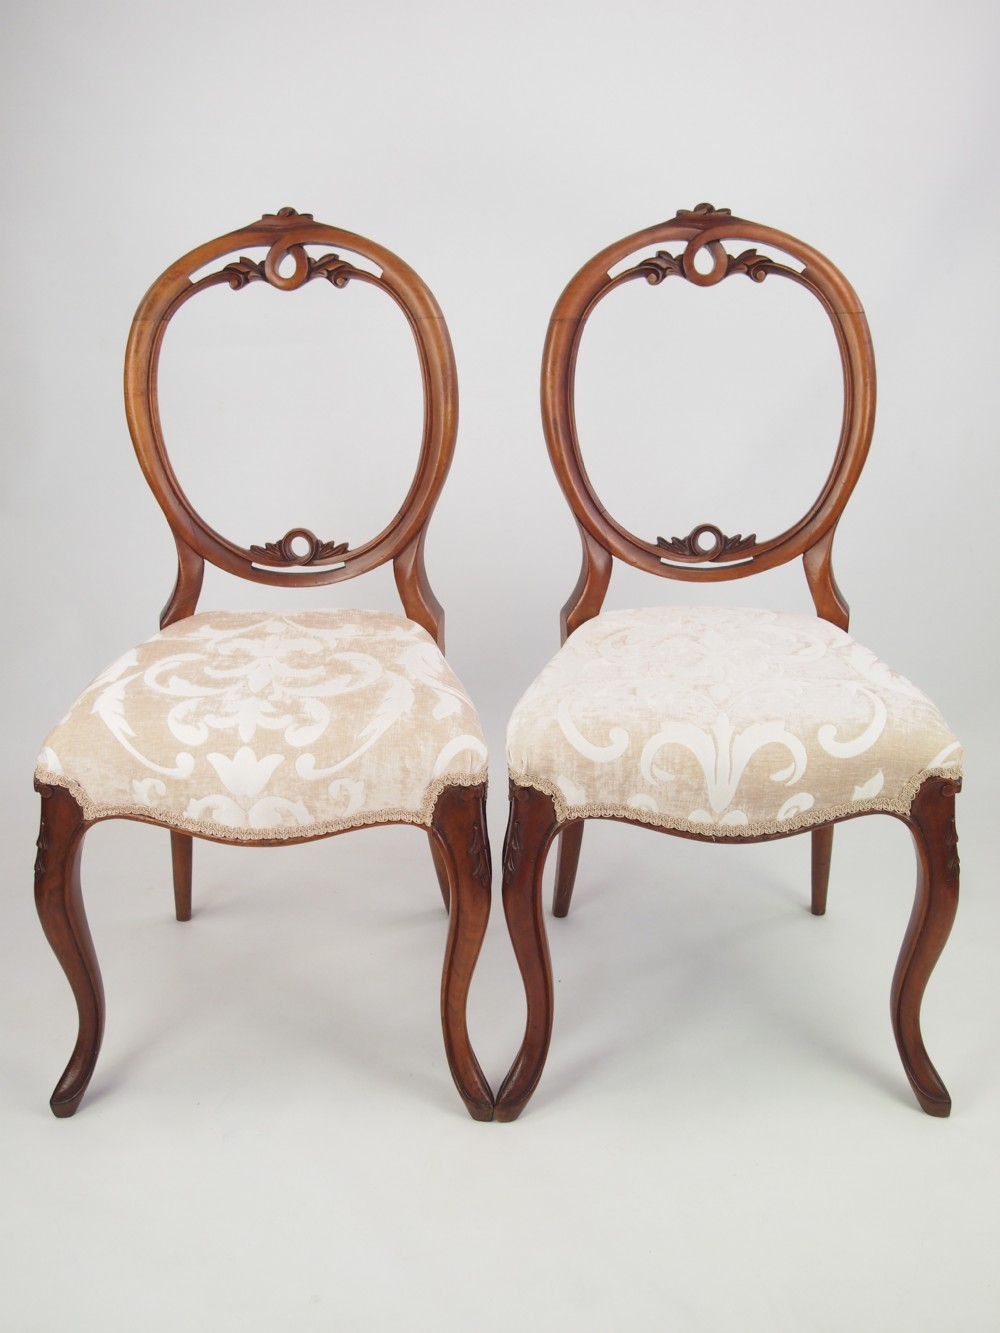 pair antique victorian walnut balloon back chairs - Pair Antique Victorian Walnut Balloon Back Chairs 266463